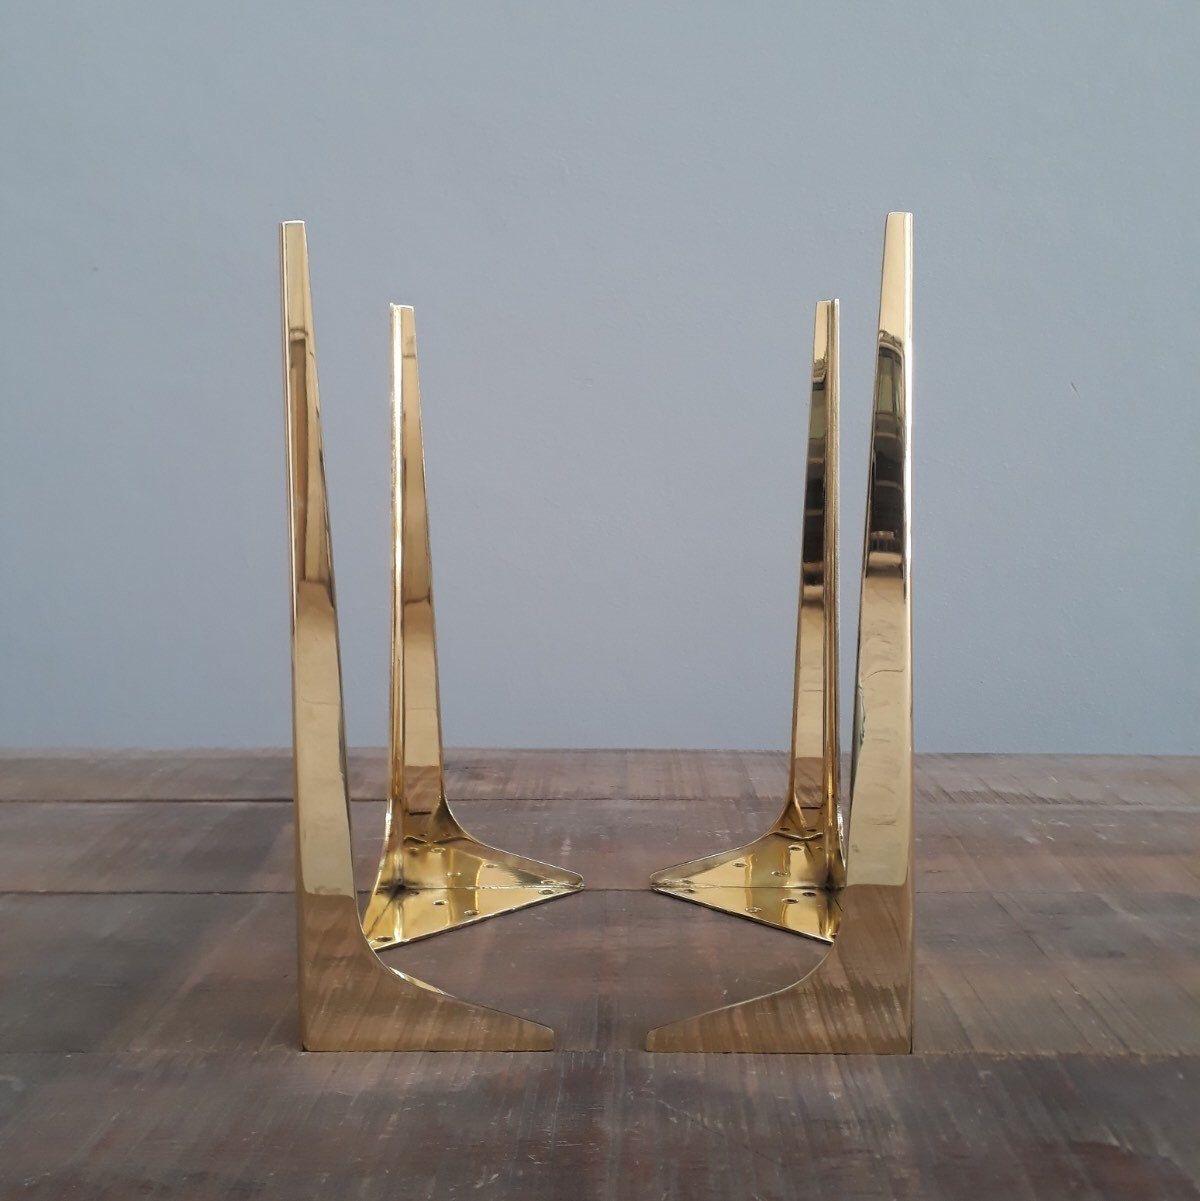 Brass Coffee Table Legs 16 Wings Metal Furniture Legs Etsy In